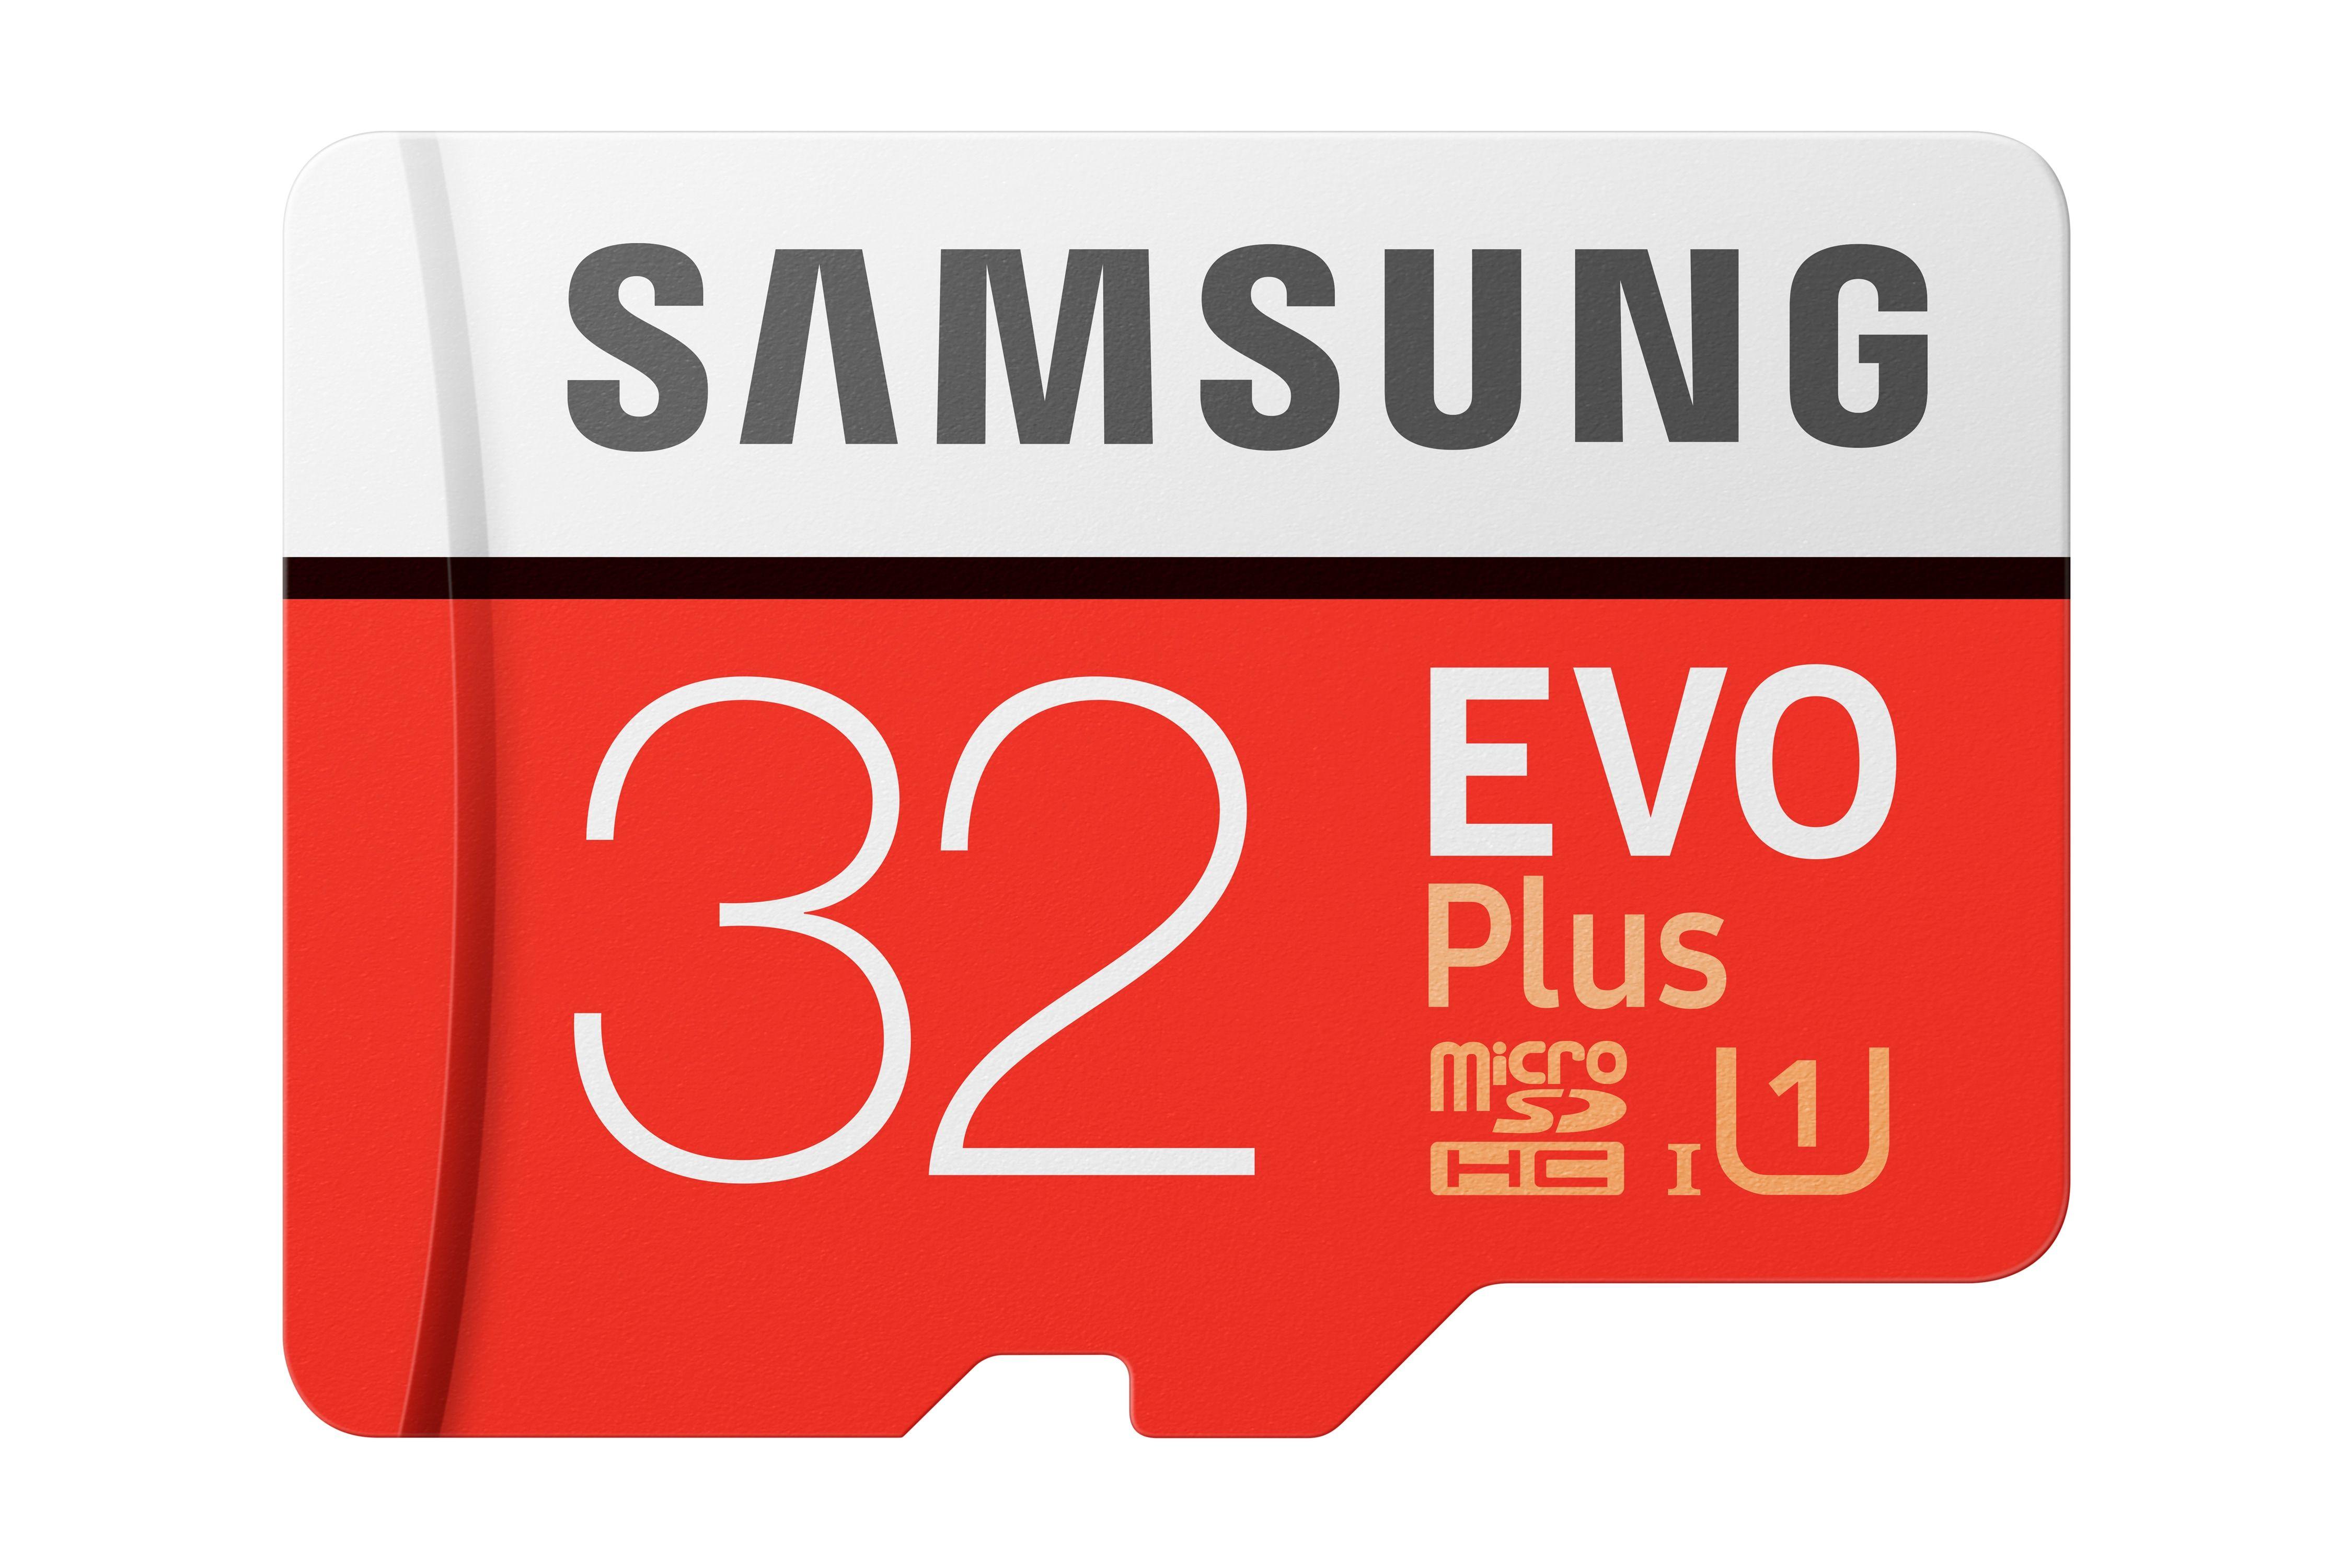 Samsung Evo Plus Microsd Memory Card 32gb Memory Storage Evo